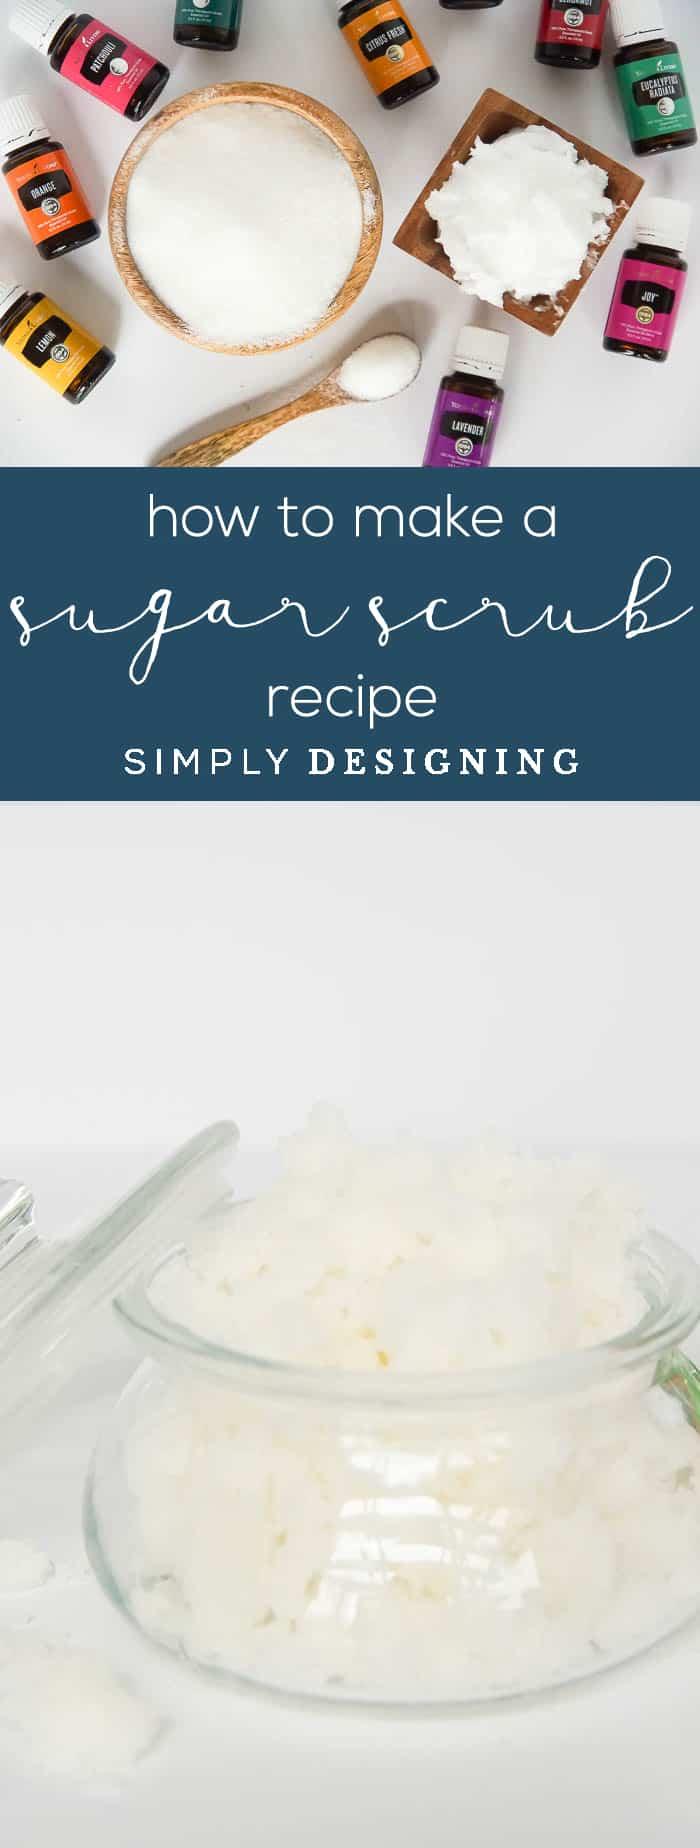 How to make a Sugar Scrub Recipe